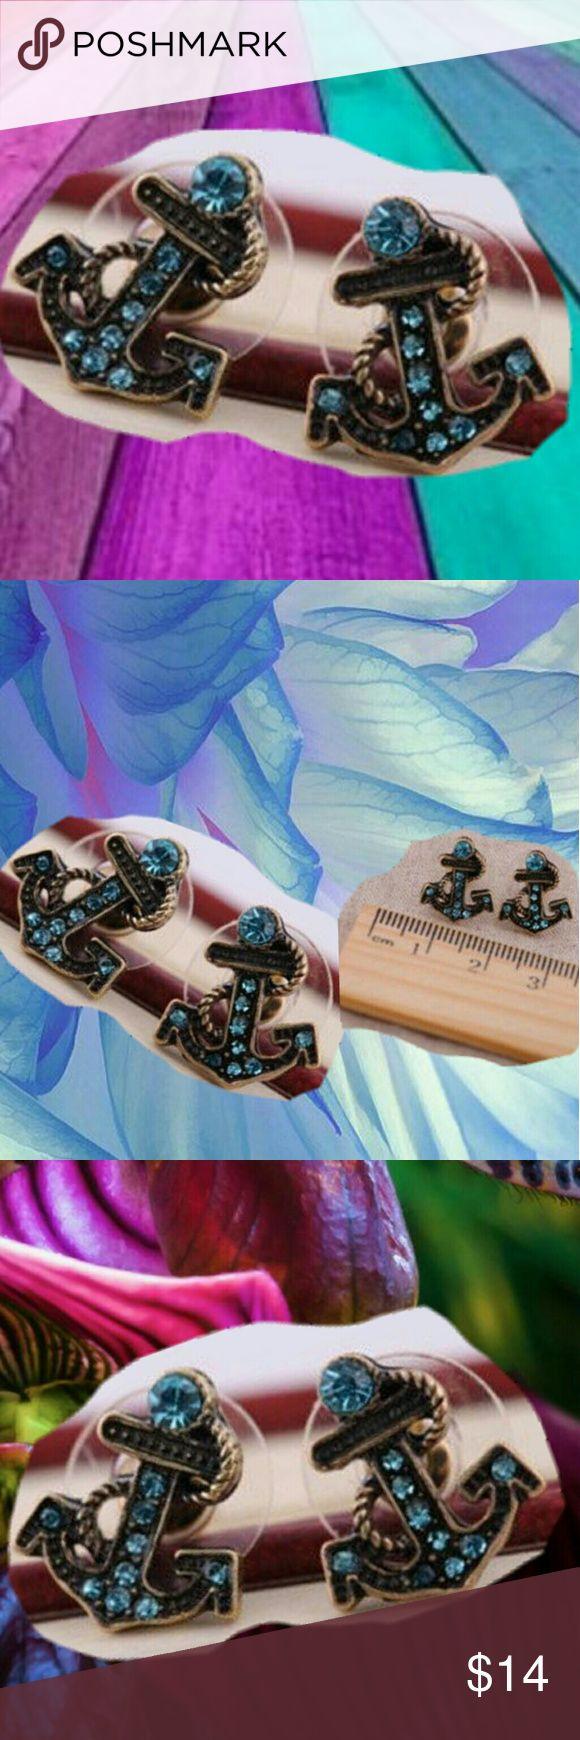 Anchor's Away Blue Anchor Earrings Anchor's Away Blue Anchor Earrings  Anchor's Away Blue Anchor Earrings Mosaic material: alloy inlay artificial gem / semi precious stones  Metal type: AlloyMain stone color: BlueMetal color: 18K Gold PlatedMain material: Diamond Cubic Zirconia . D16  . Jewelry Earrings